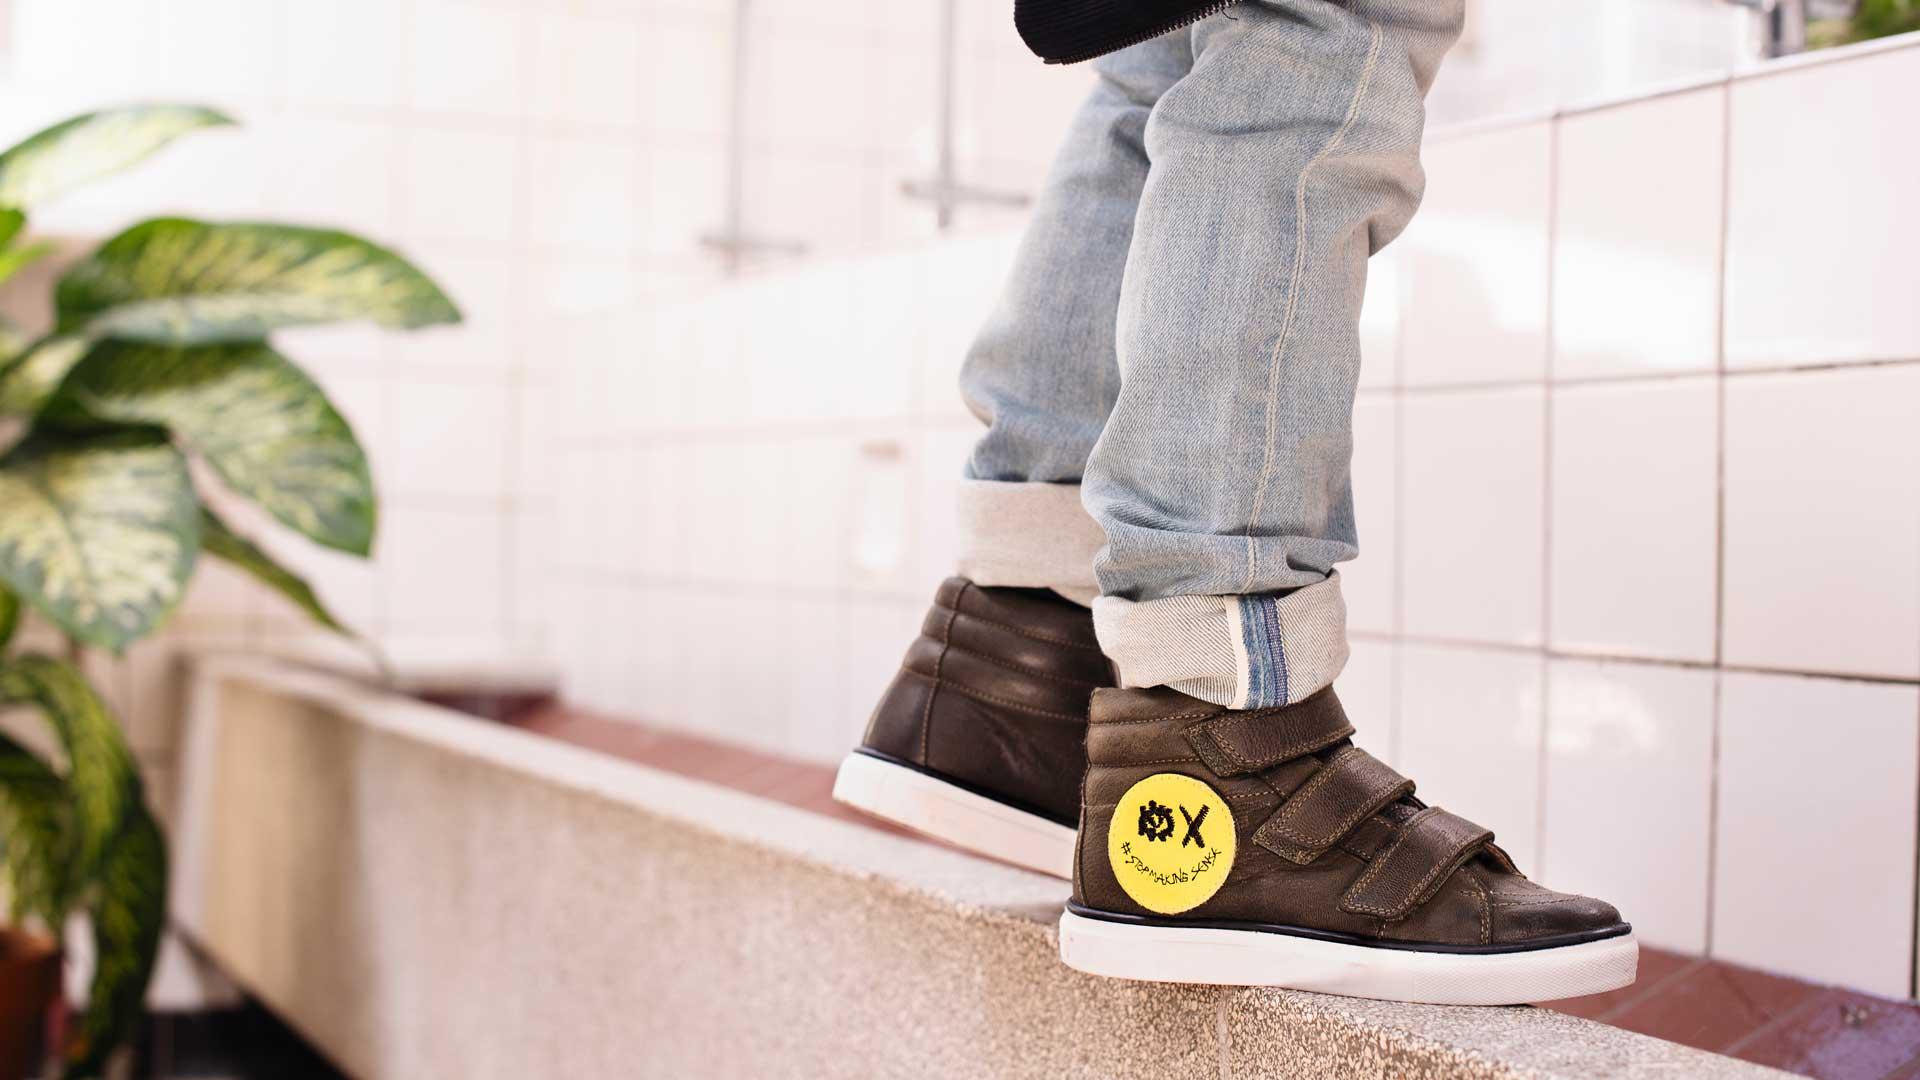 Blackstone schoenen dames online dating